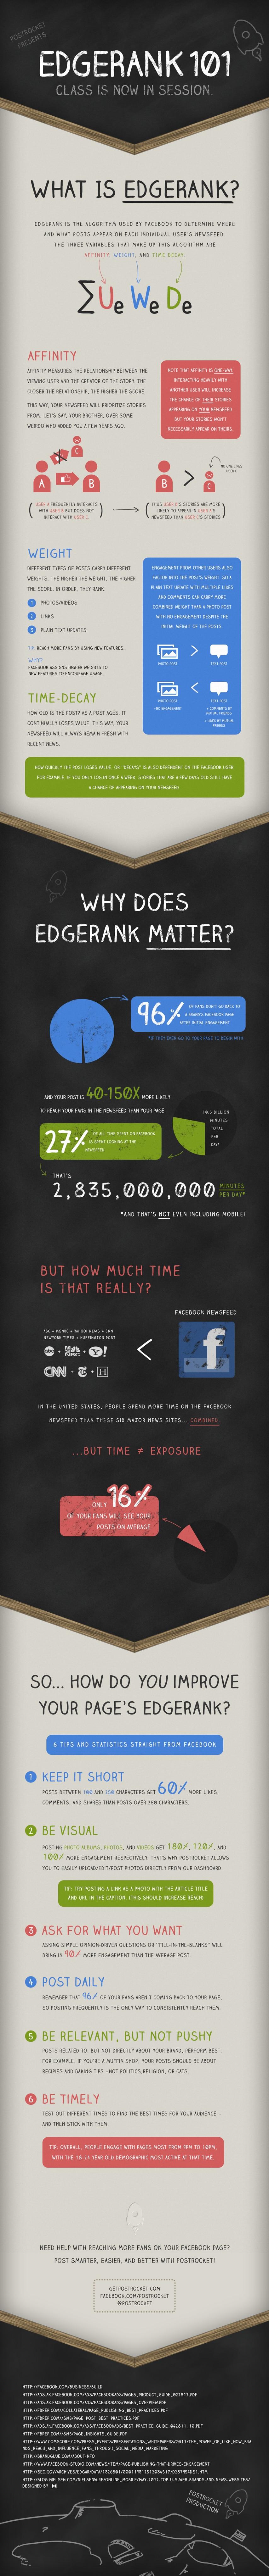 edgerank-facebook-newsfeed-algorithm-infographic